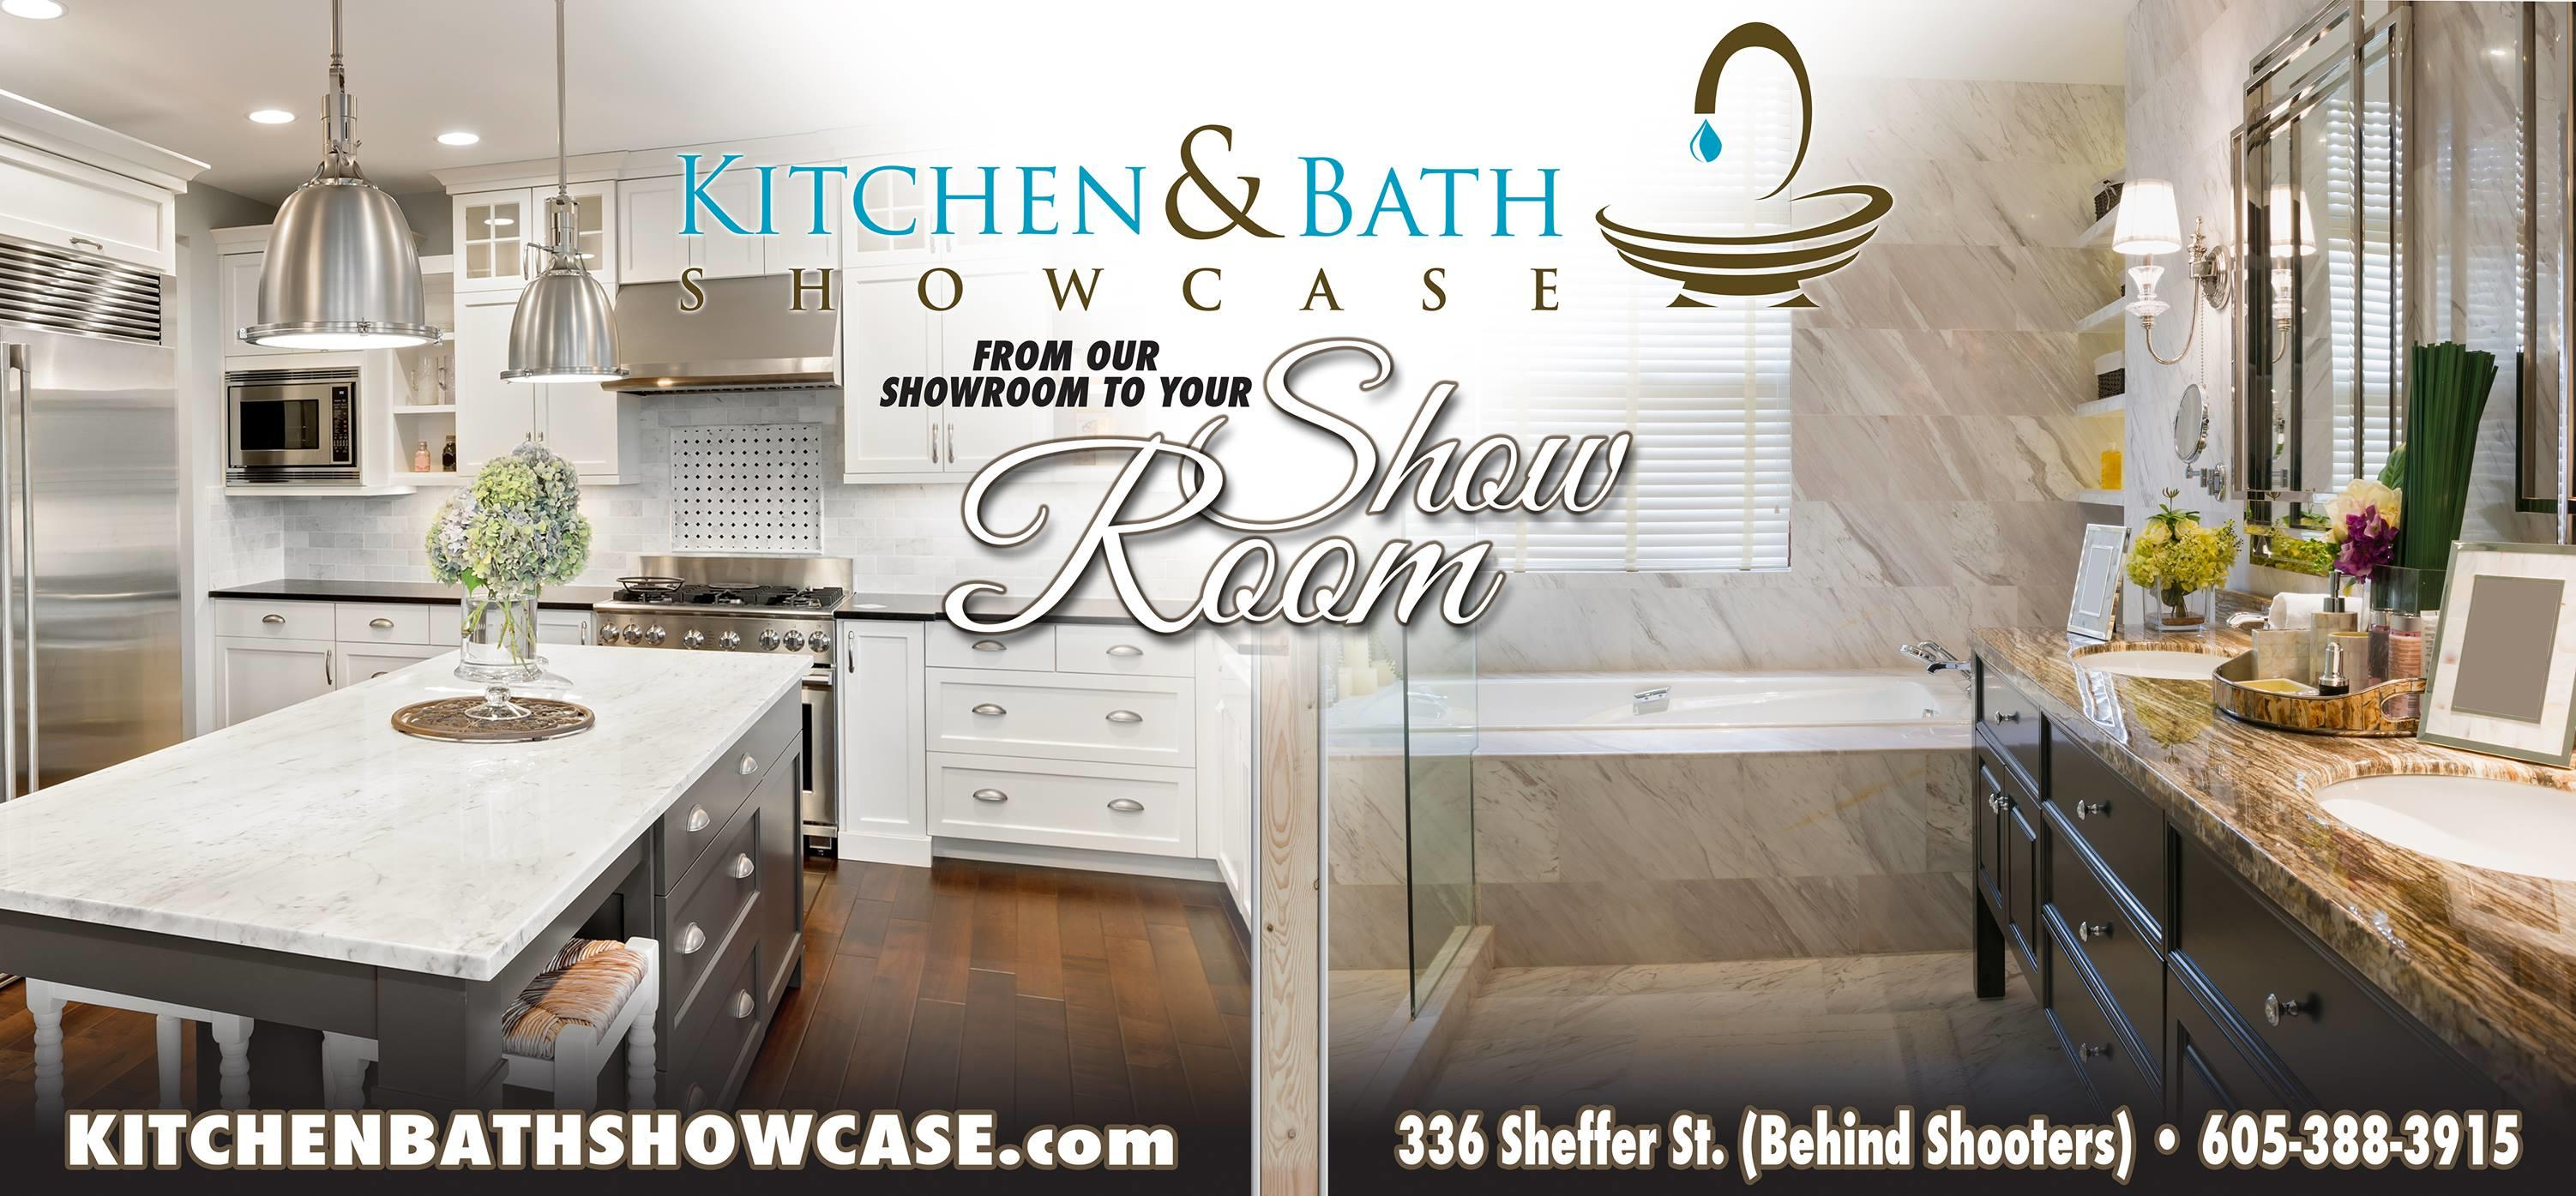 Kitchen bath showcase rapid city south dakota sd for Bathroom showcases near me